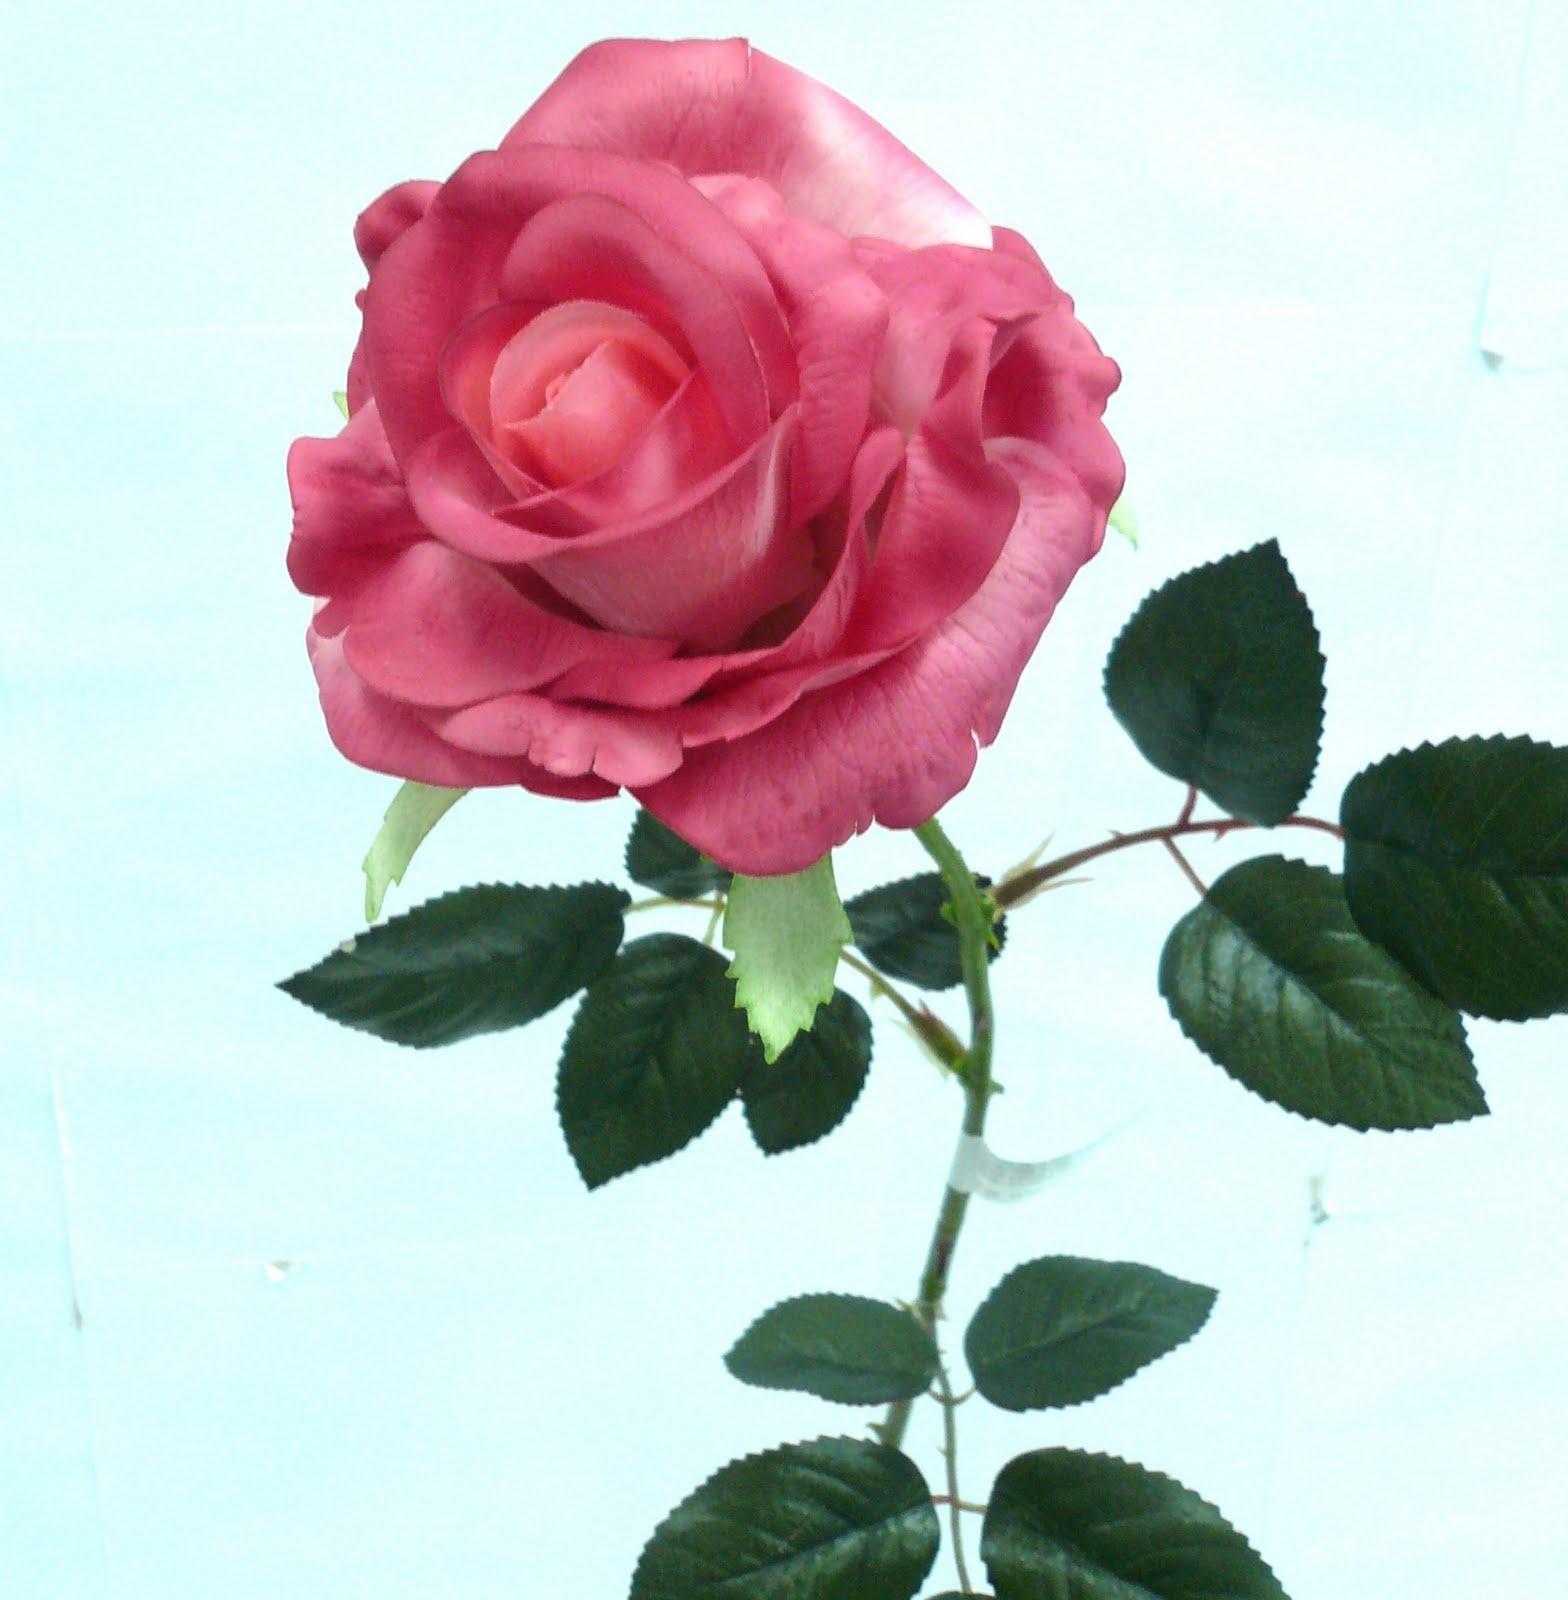 eleletsitz: Single Pink Rose Stem Images  eleletsitz: Sin...